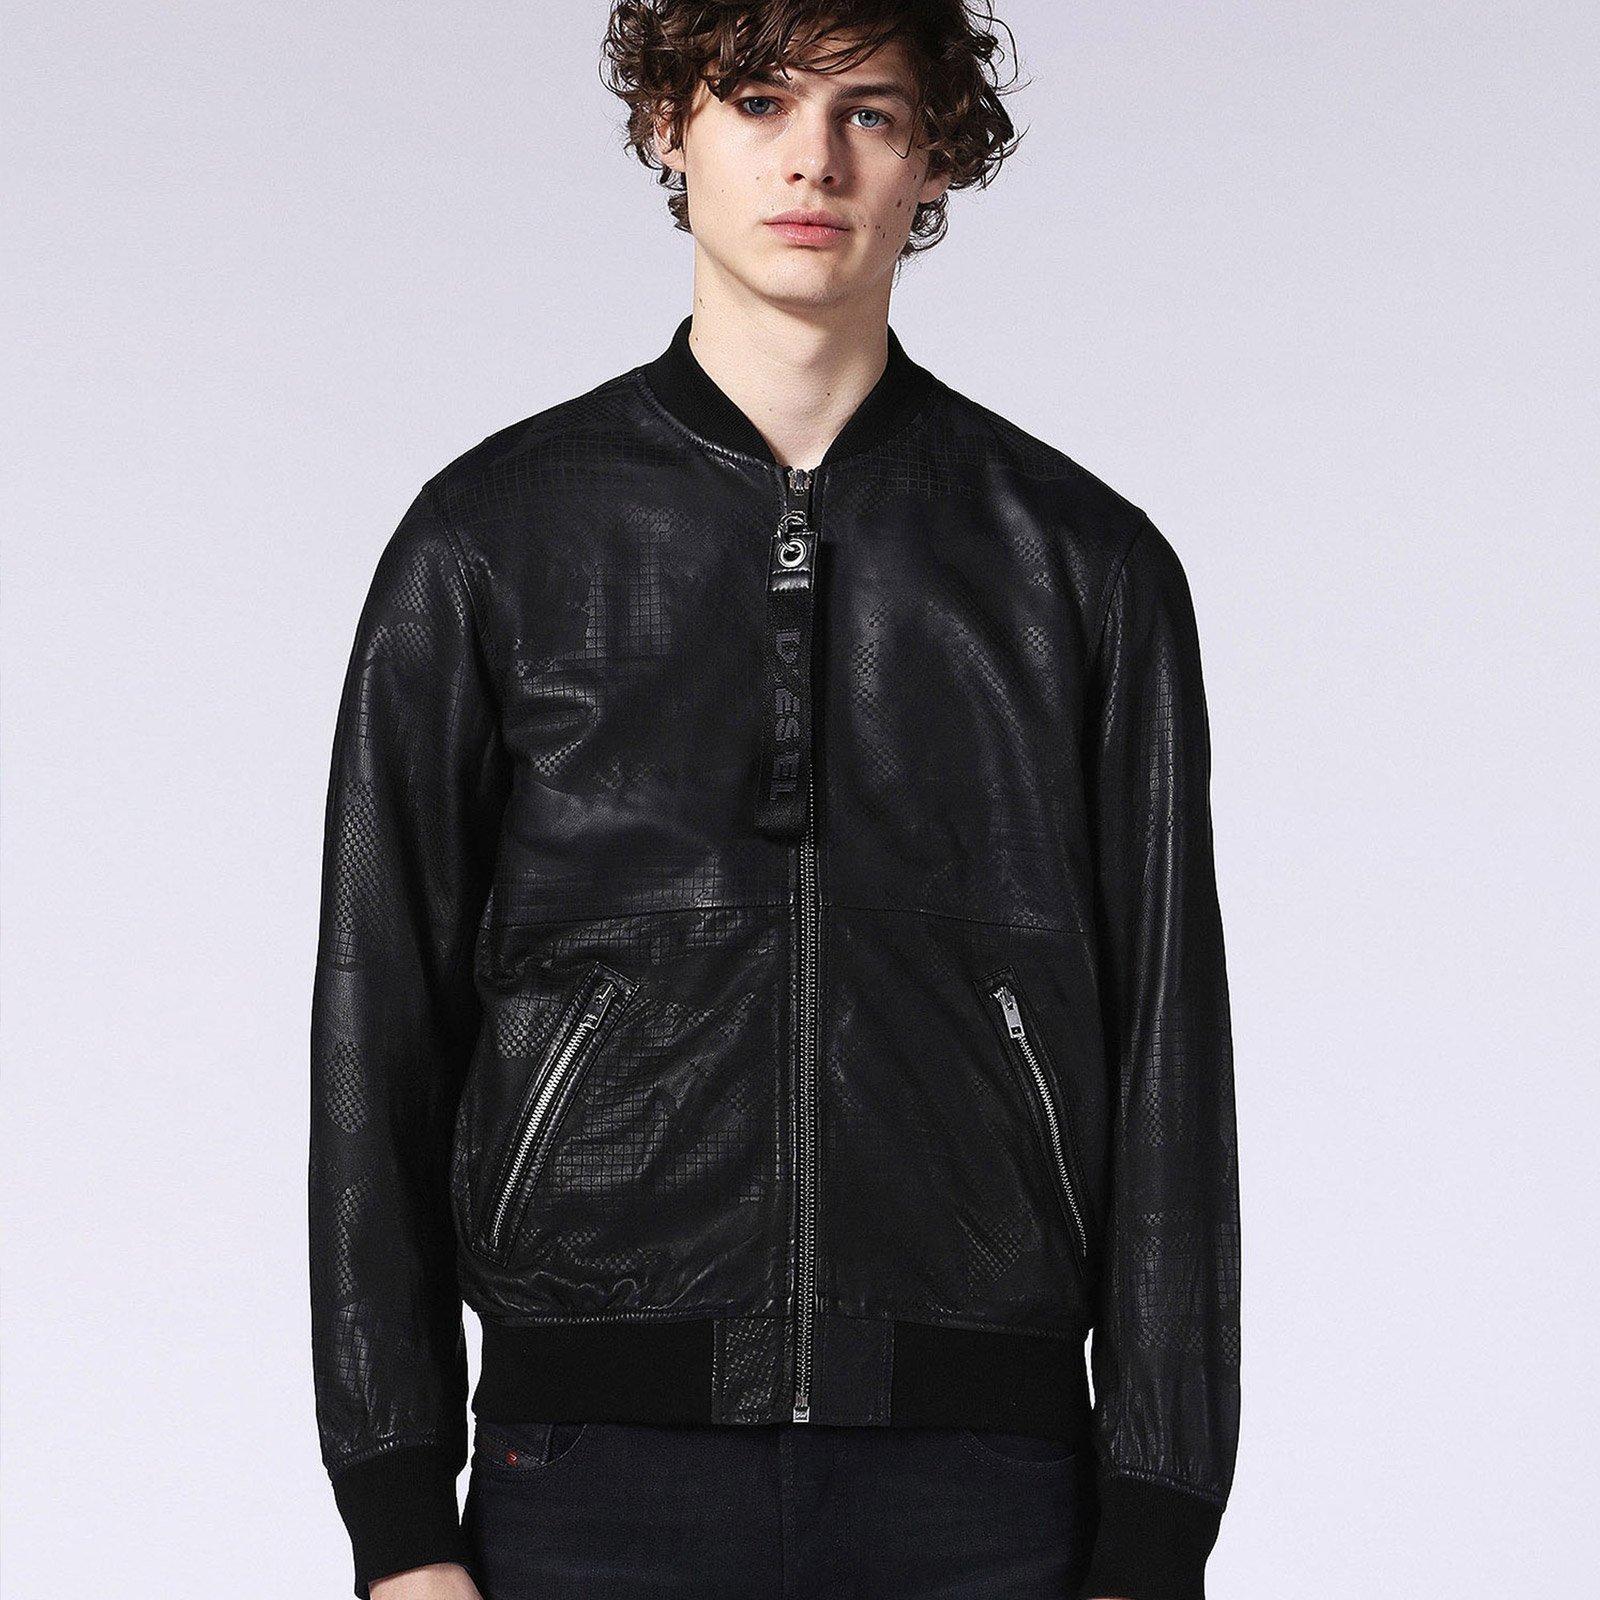 e169f9991 L-Parker Laser Print Leather Jacket - Jackets-Casual : Fifth Avenue ...